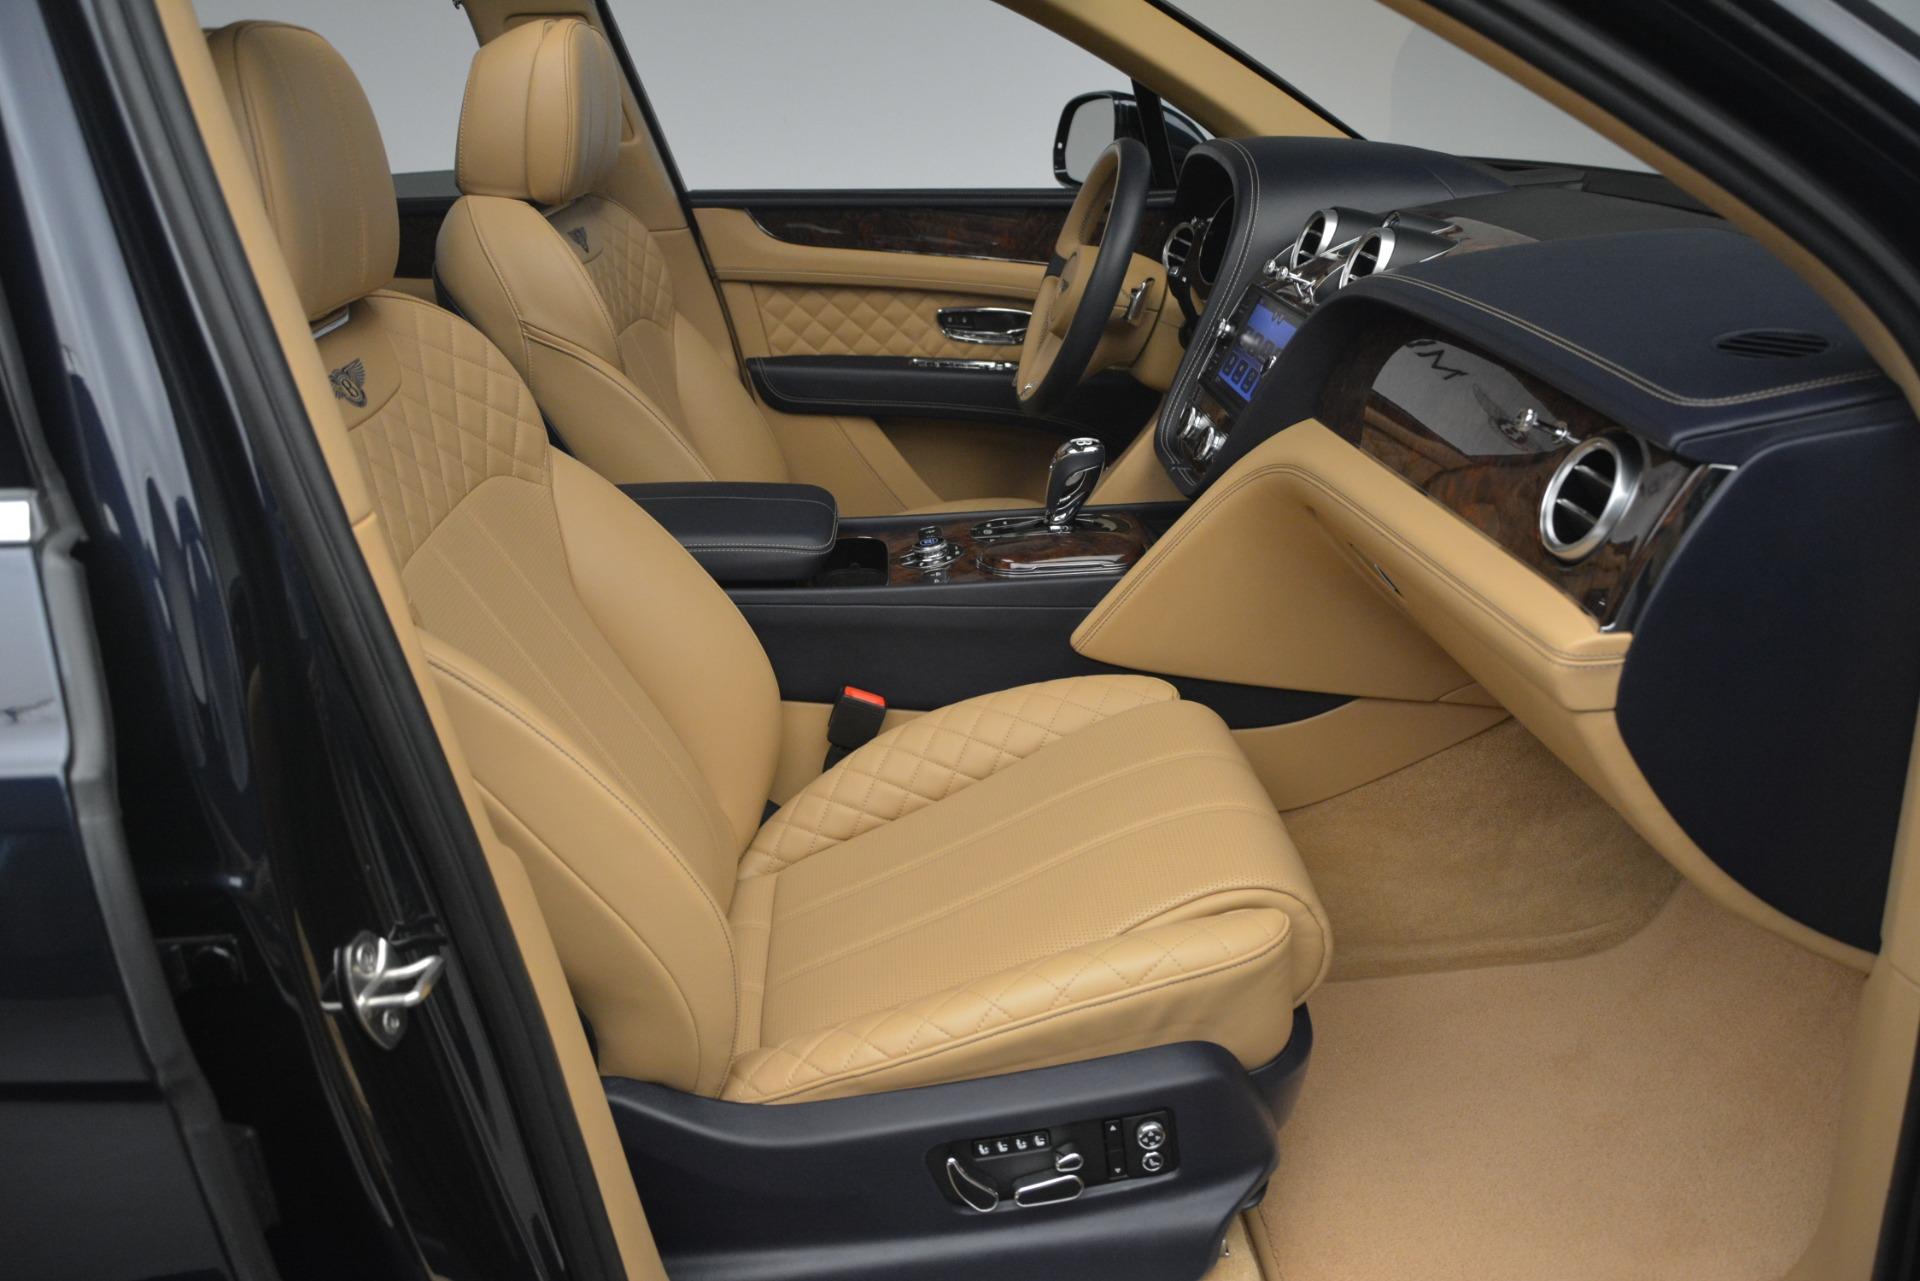 Used 2017 Bentley Bentayga W12 For Sale In Greenwich, CT. Alfa Romeo of Greenwich, 7474 2934_p26